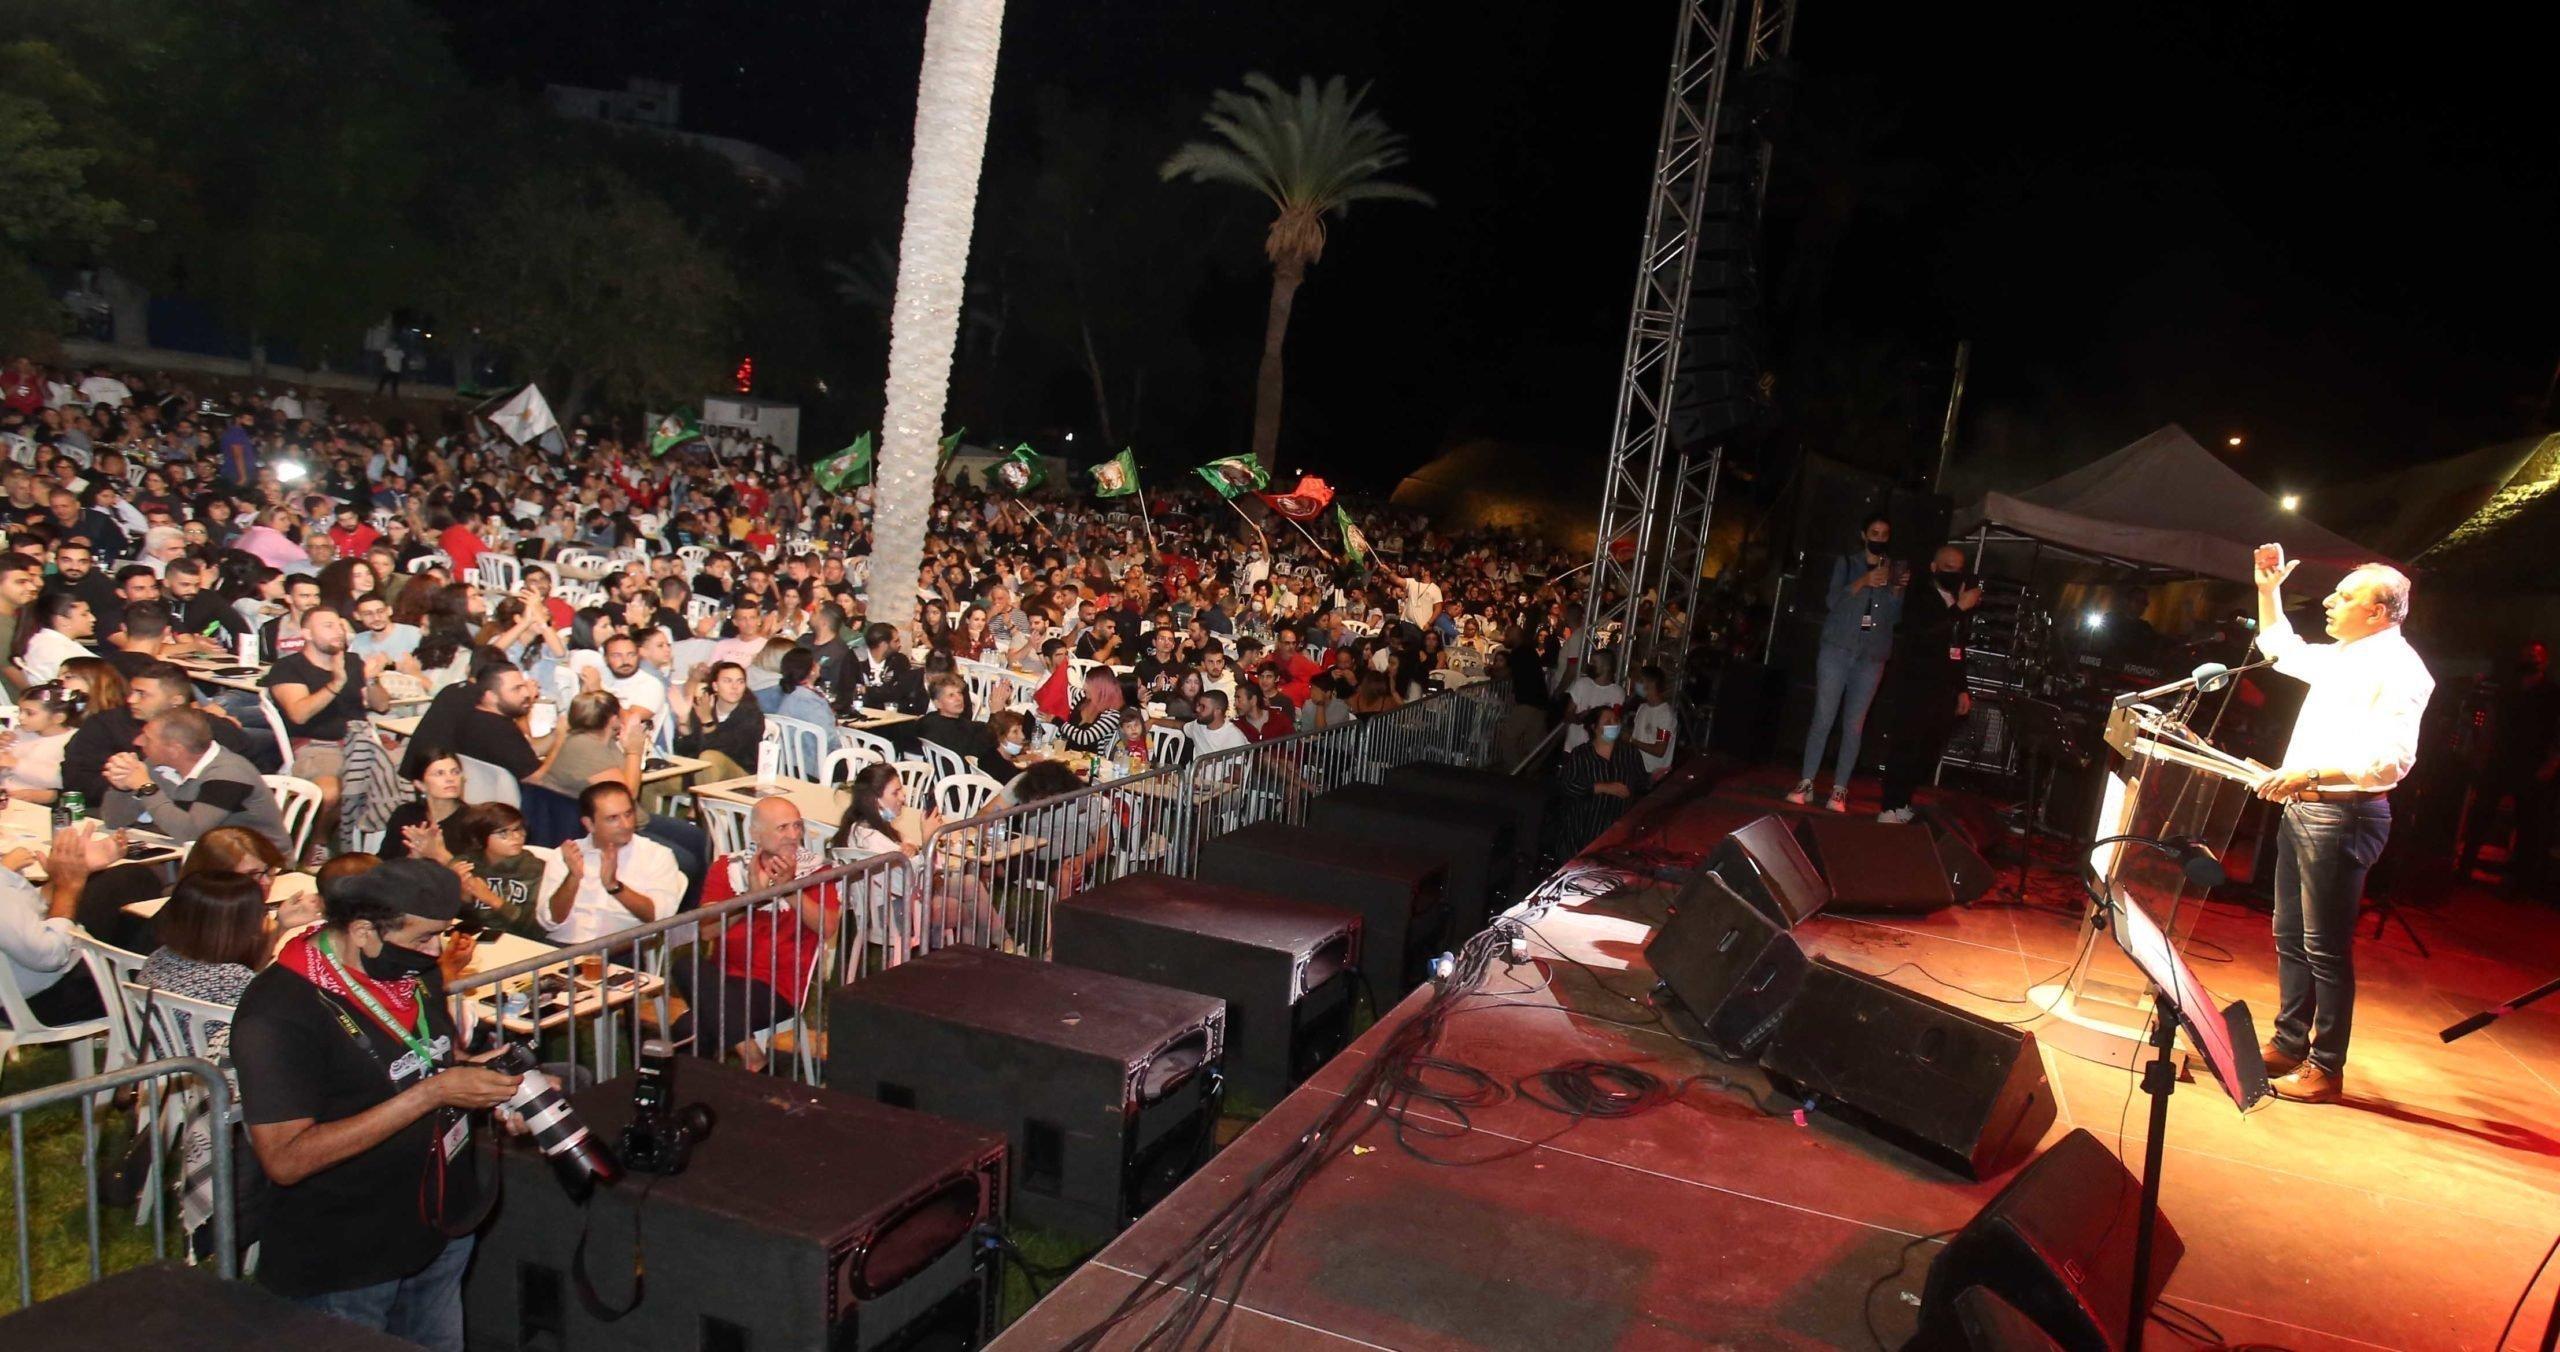 Festival Edon Stefanou Papakonstantinou 45 Scaled